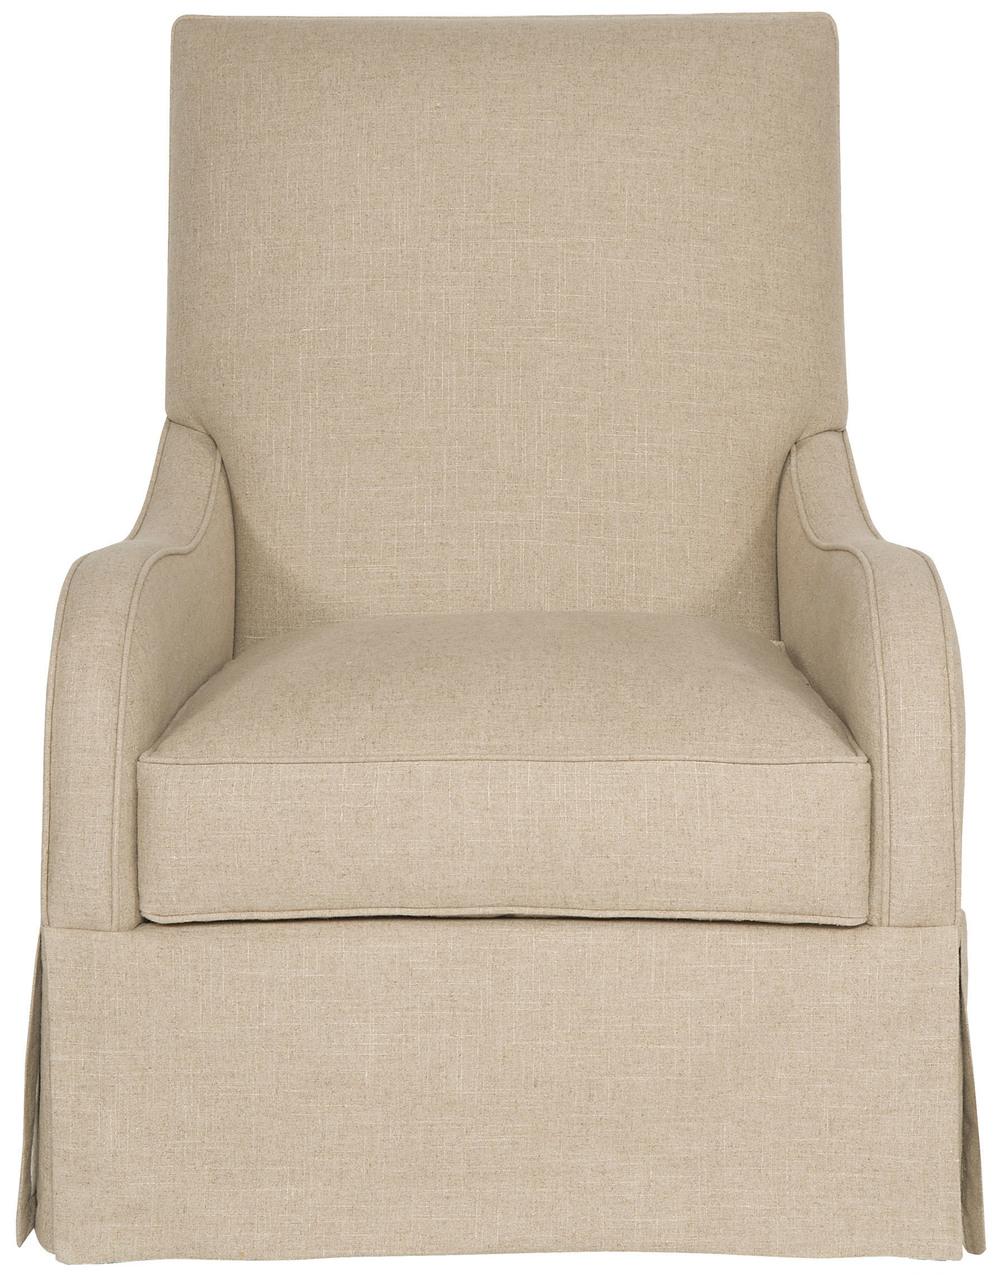 Vanguard Furniture - Zoe Swivel Glider Chair